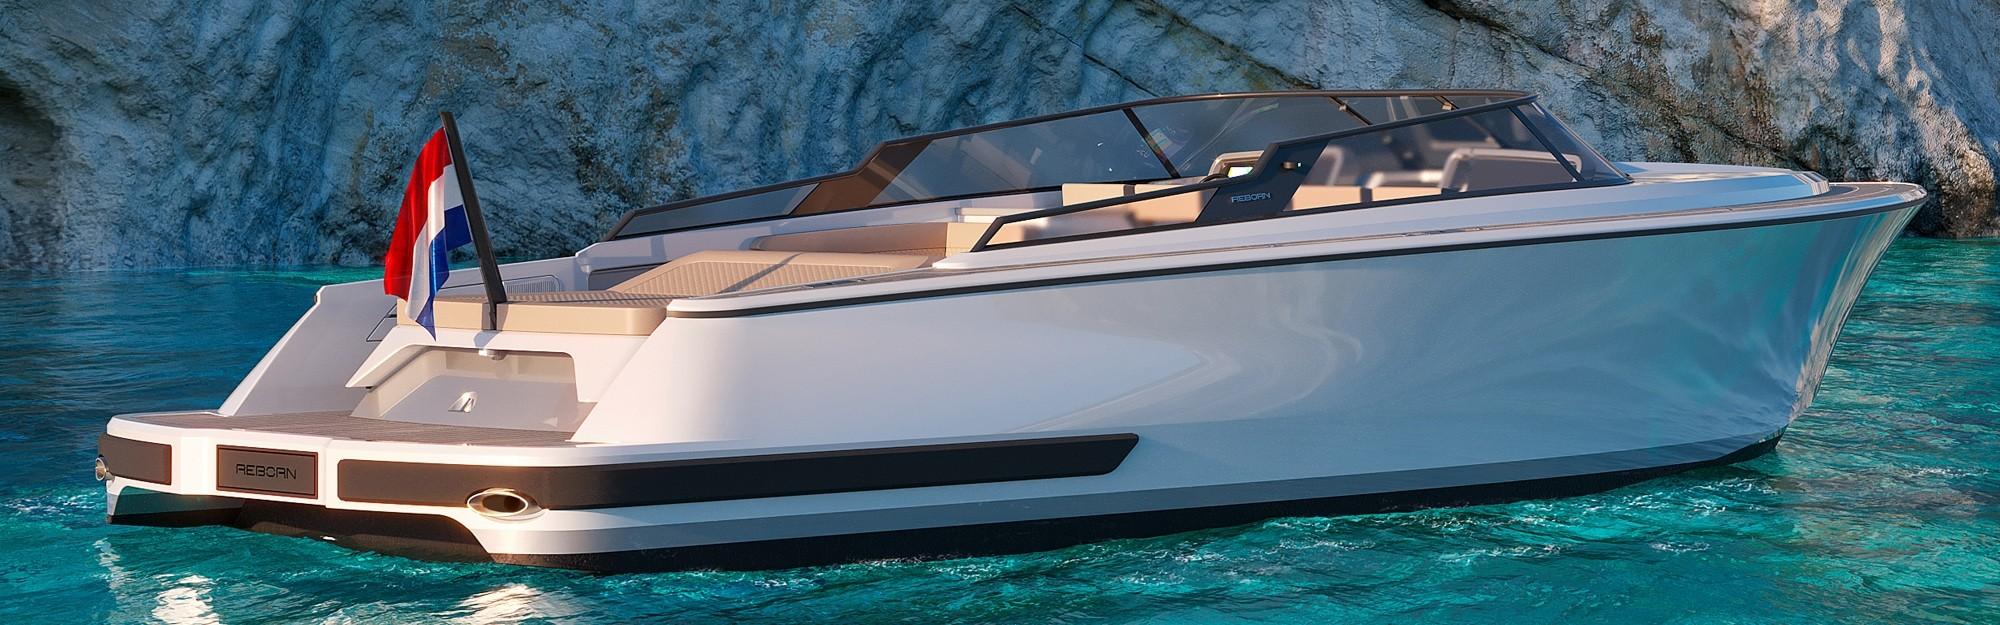 Reborn-Yachts-40R_3